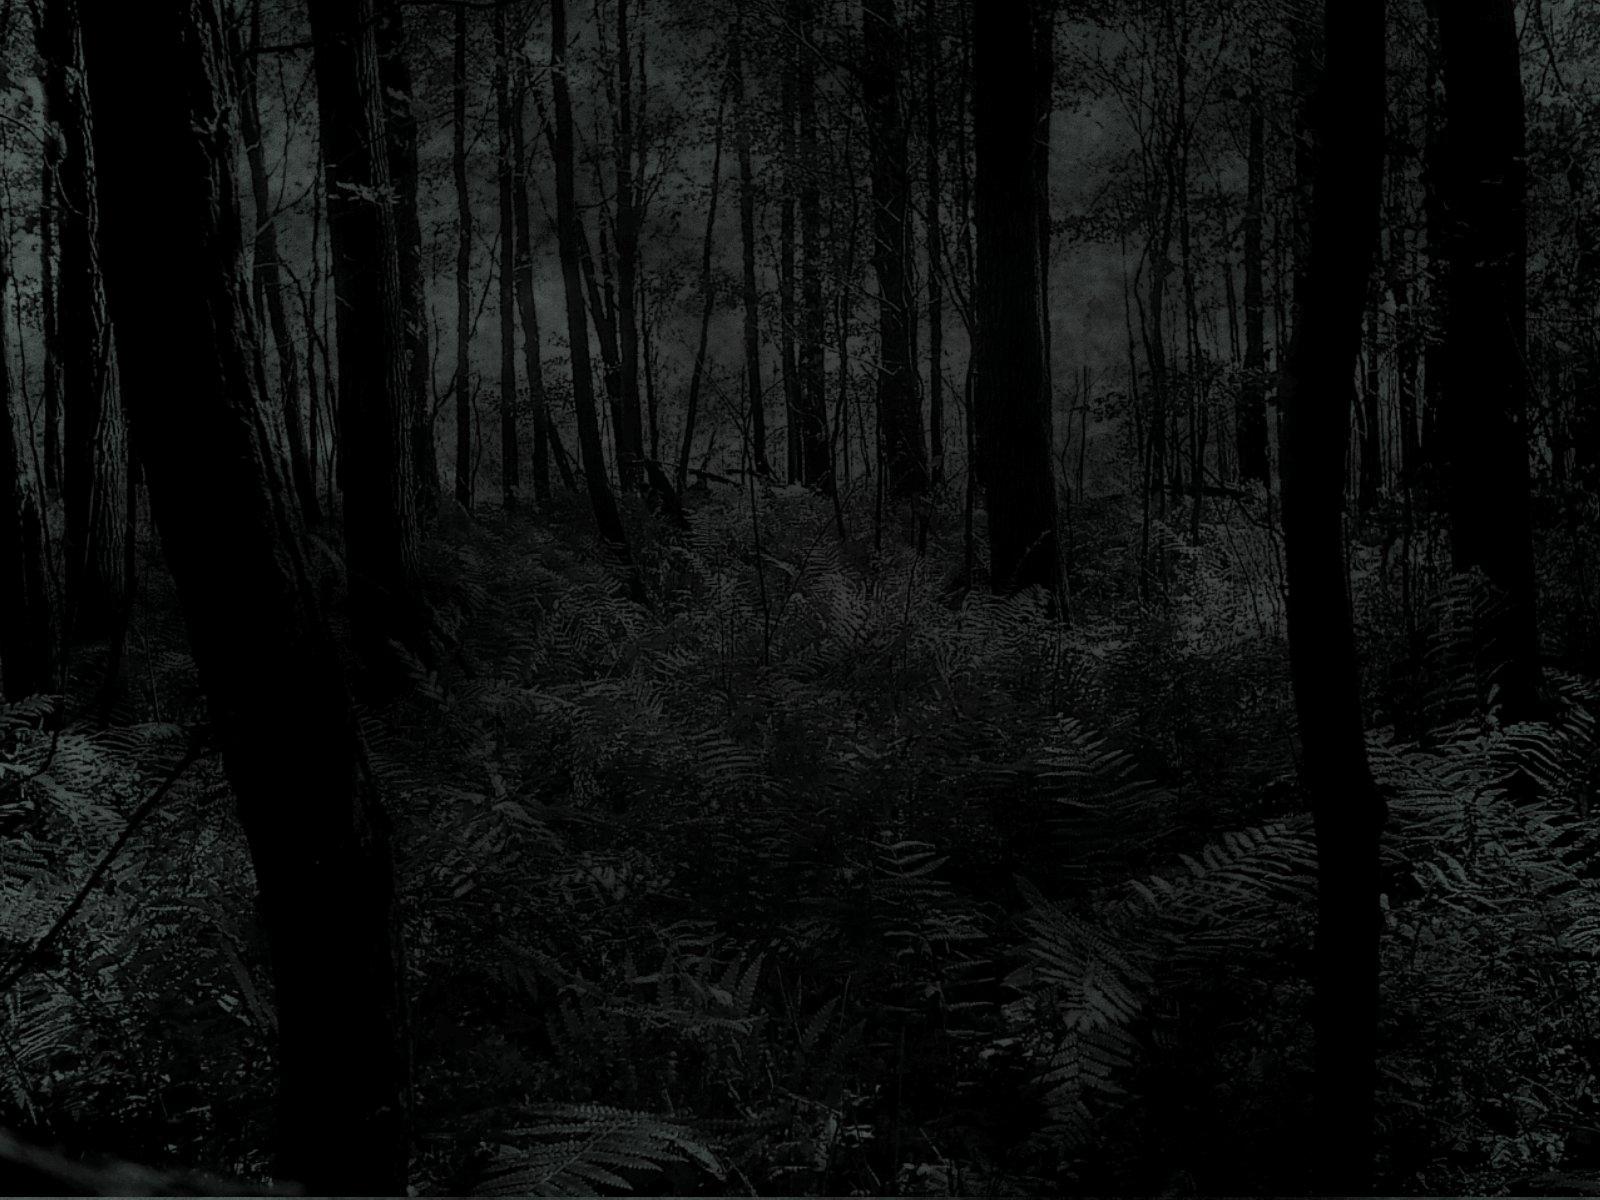 Creepy Forest Wallpaper 1600x1200